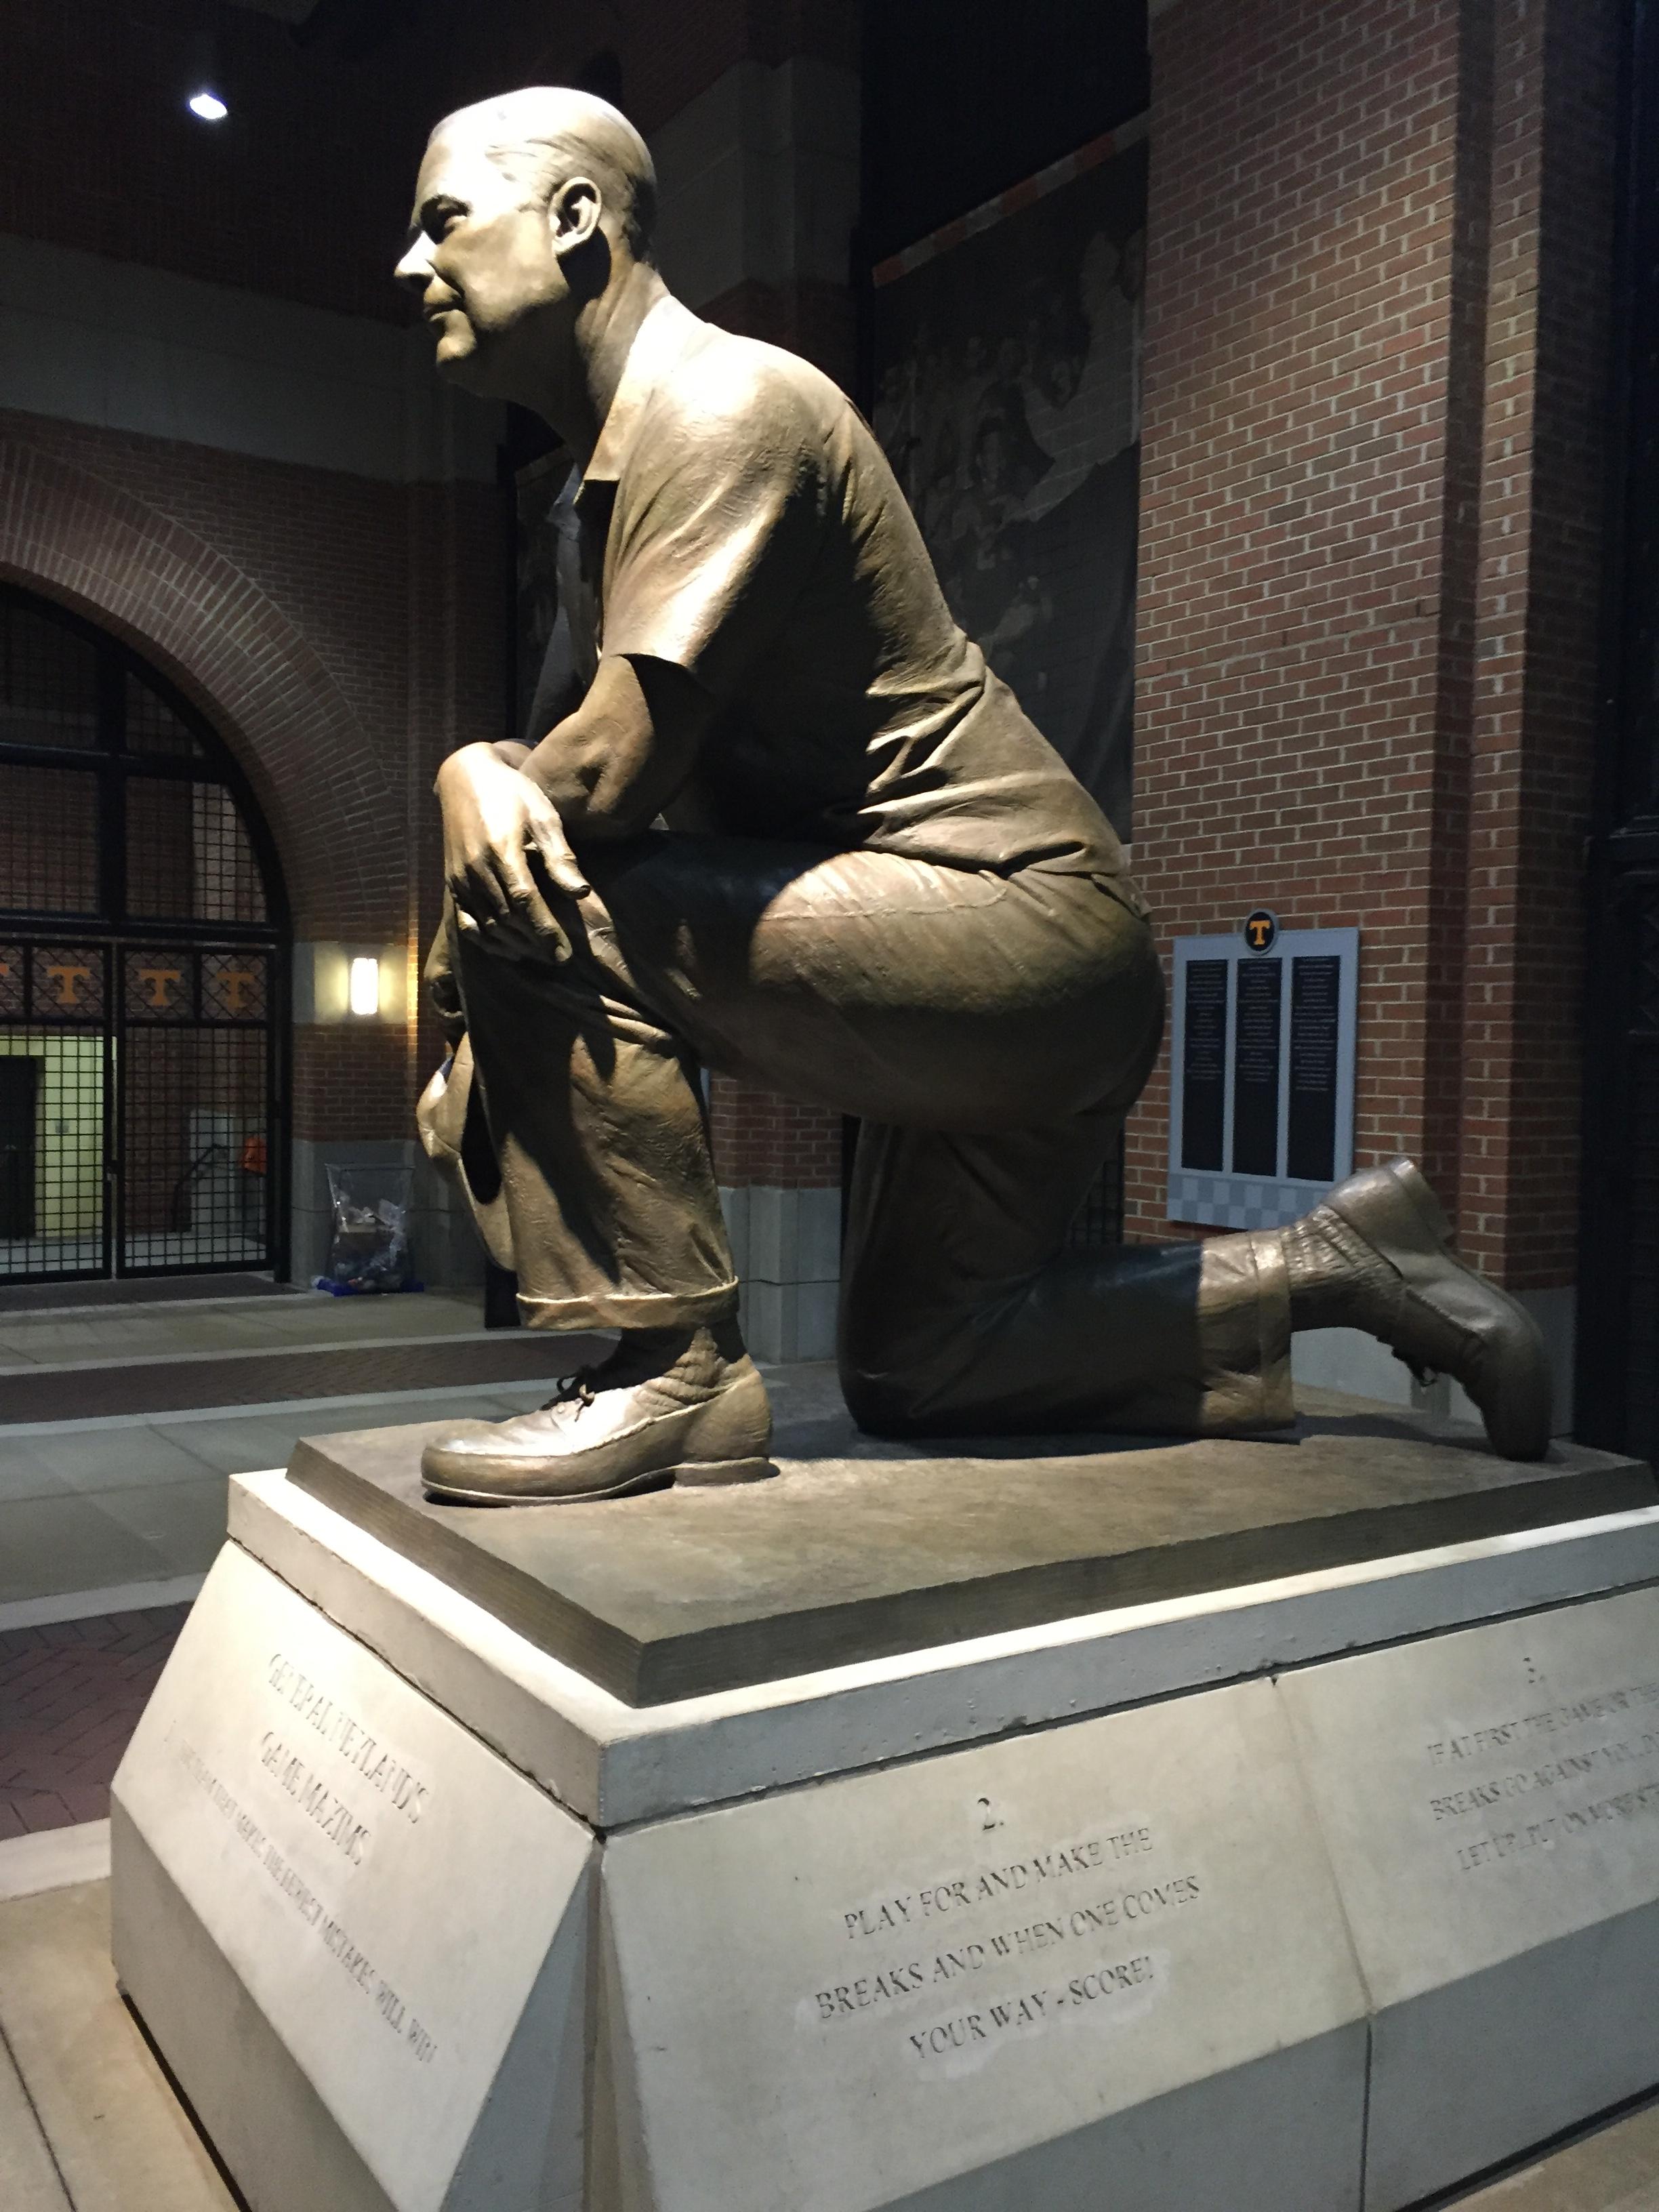 Mike Shell Capital Neyland Stadiium Statue